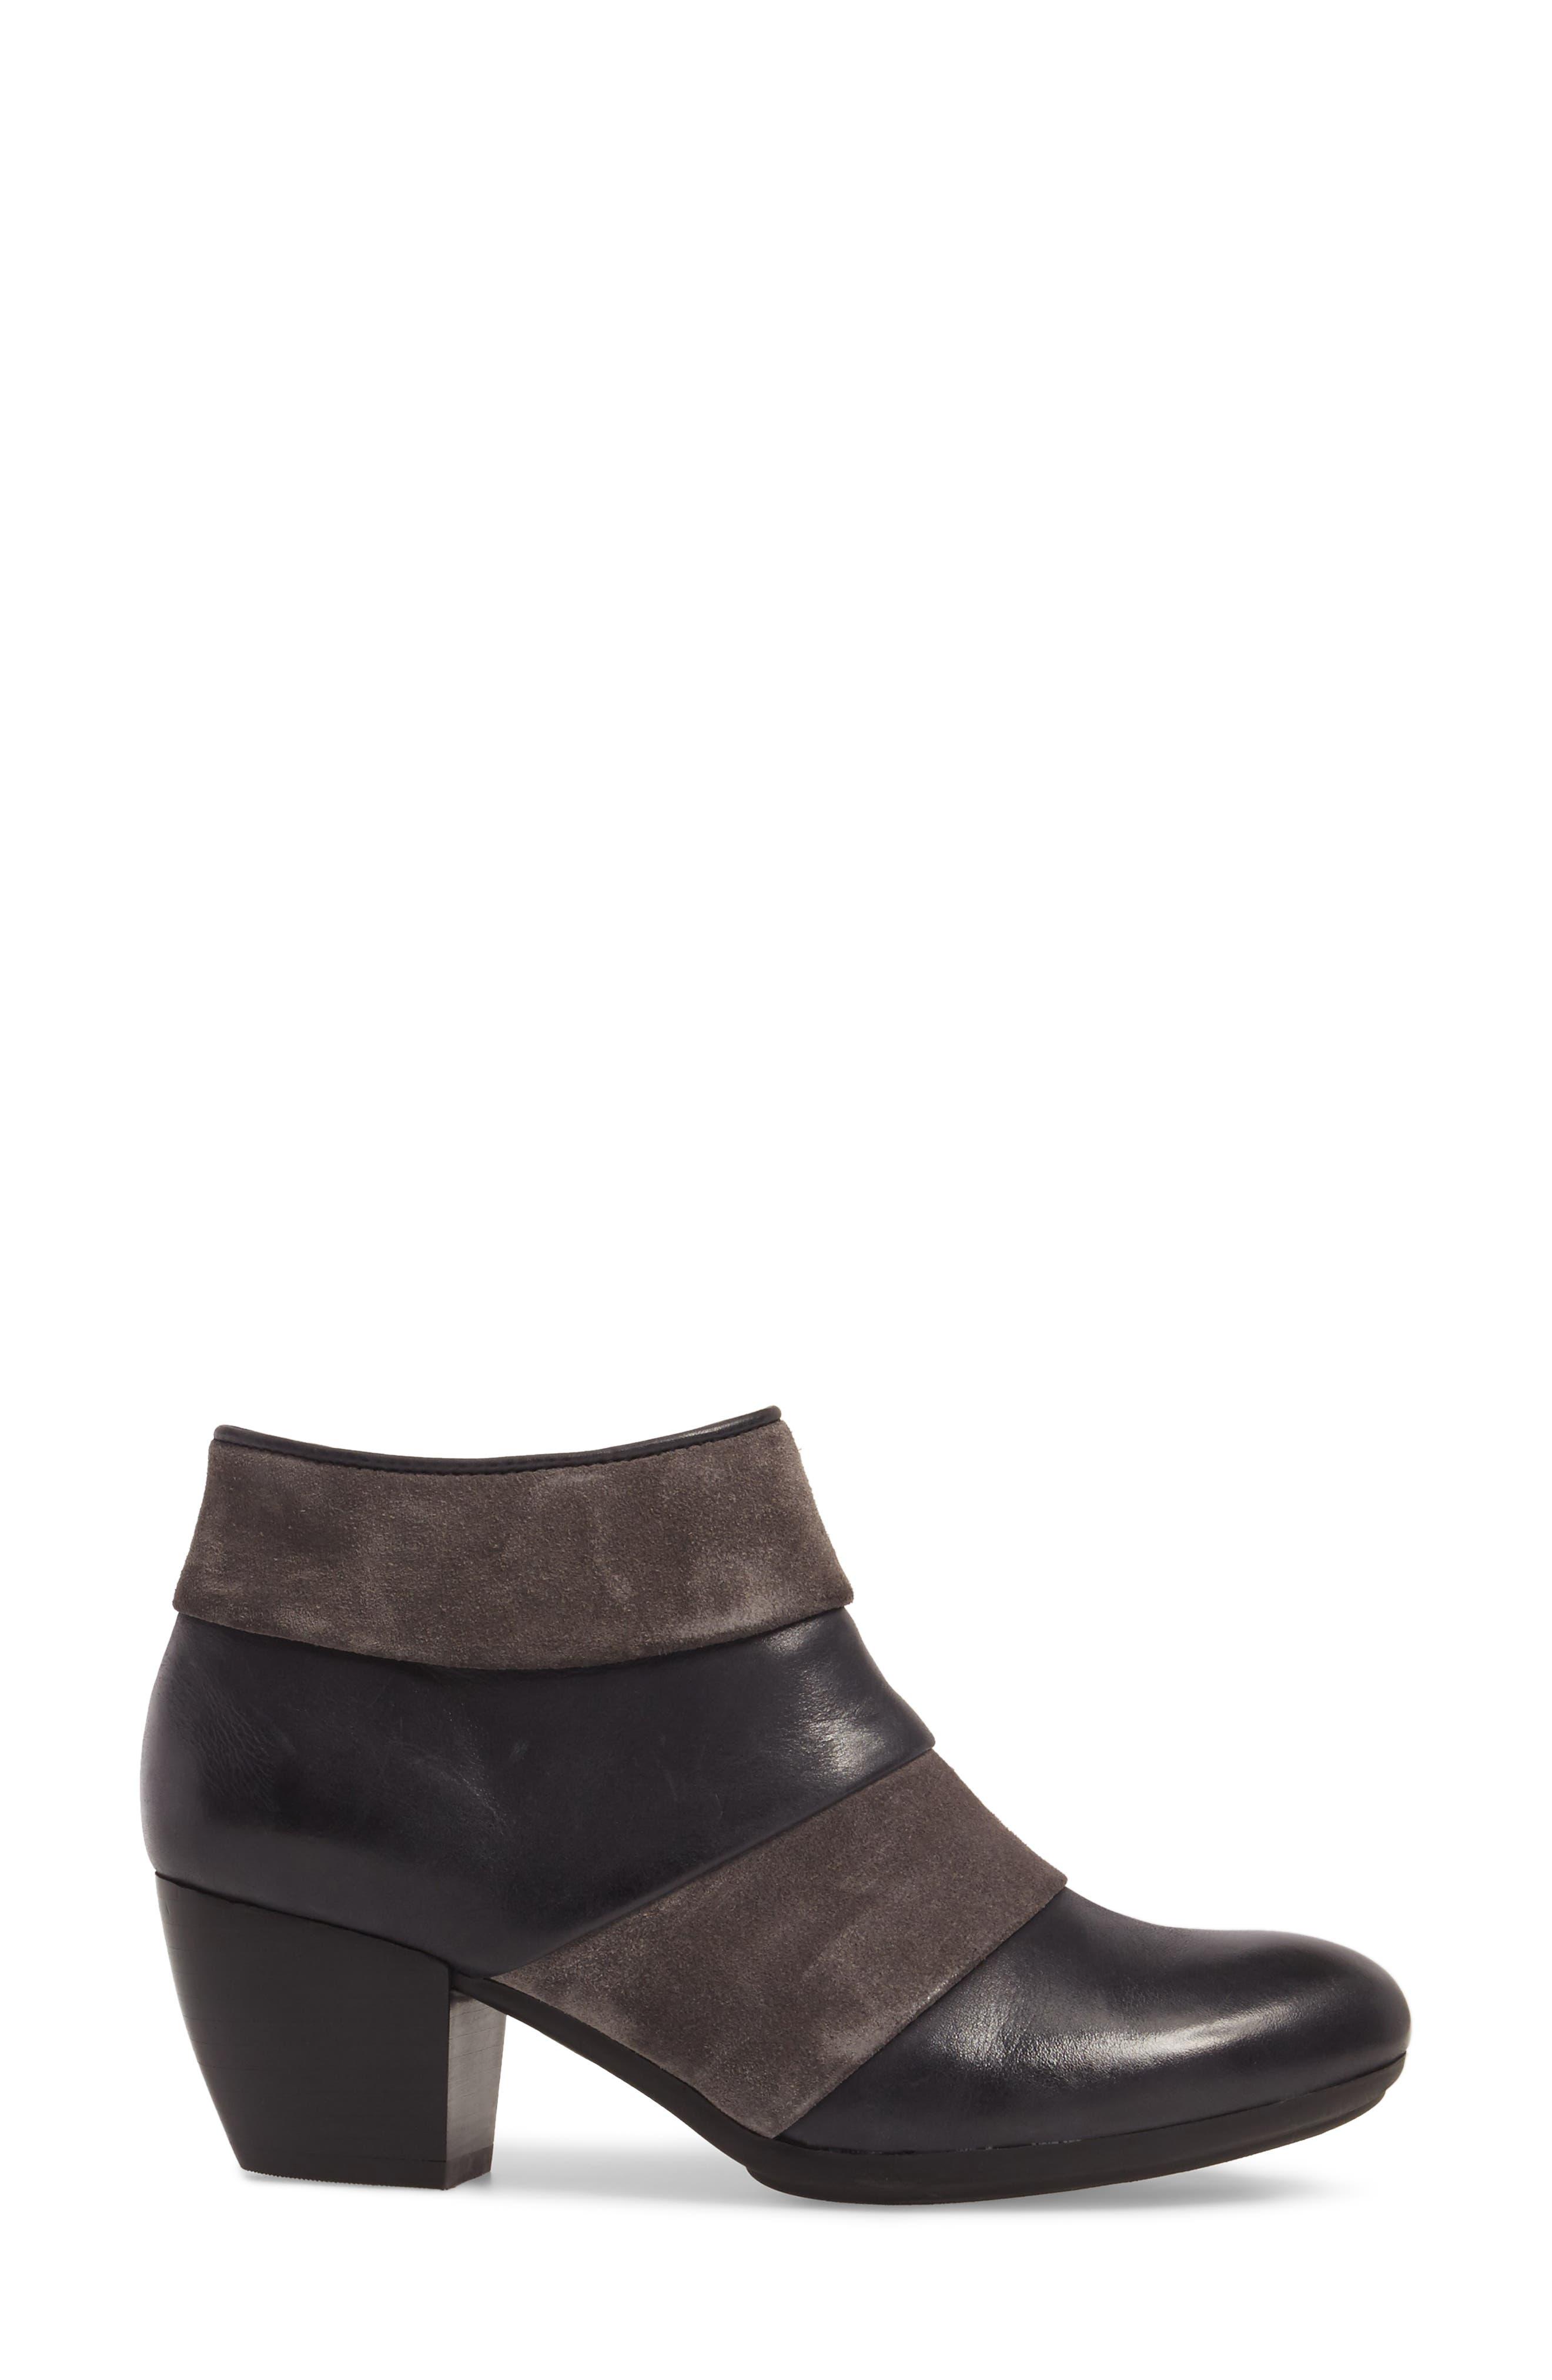 Amesbury Colorblock Bootie,                             Alternate thumbnail 3, color,                             Black/ Steel Grey Leather